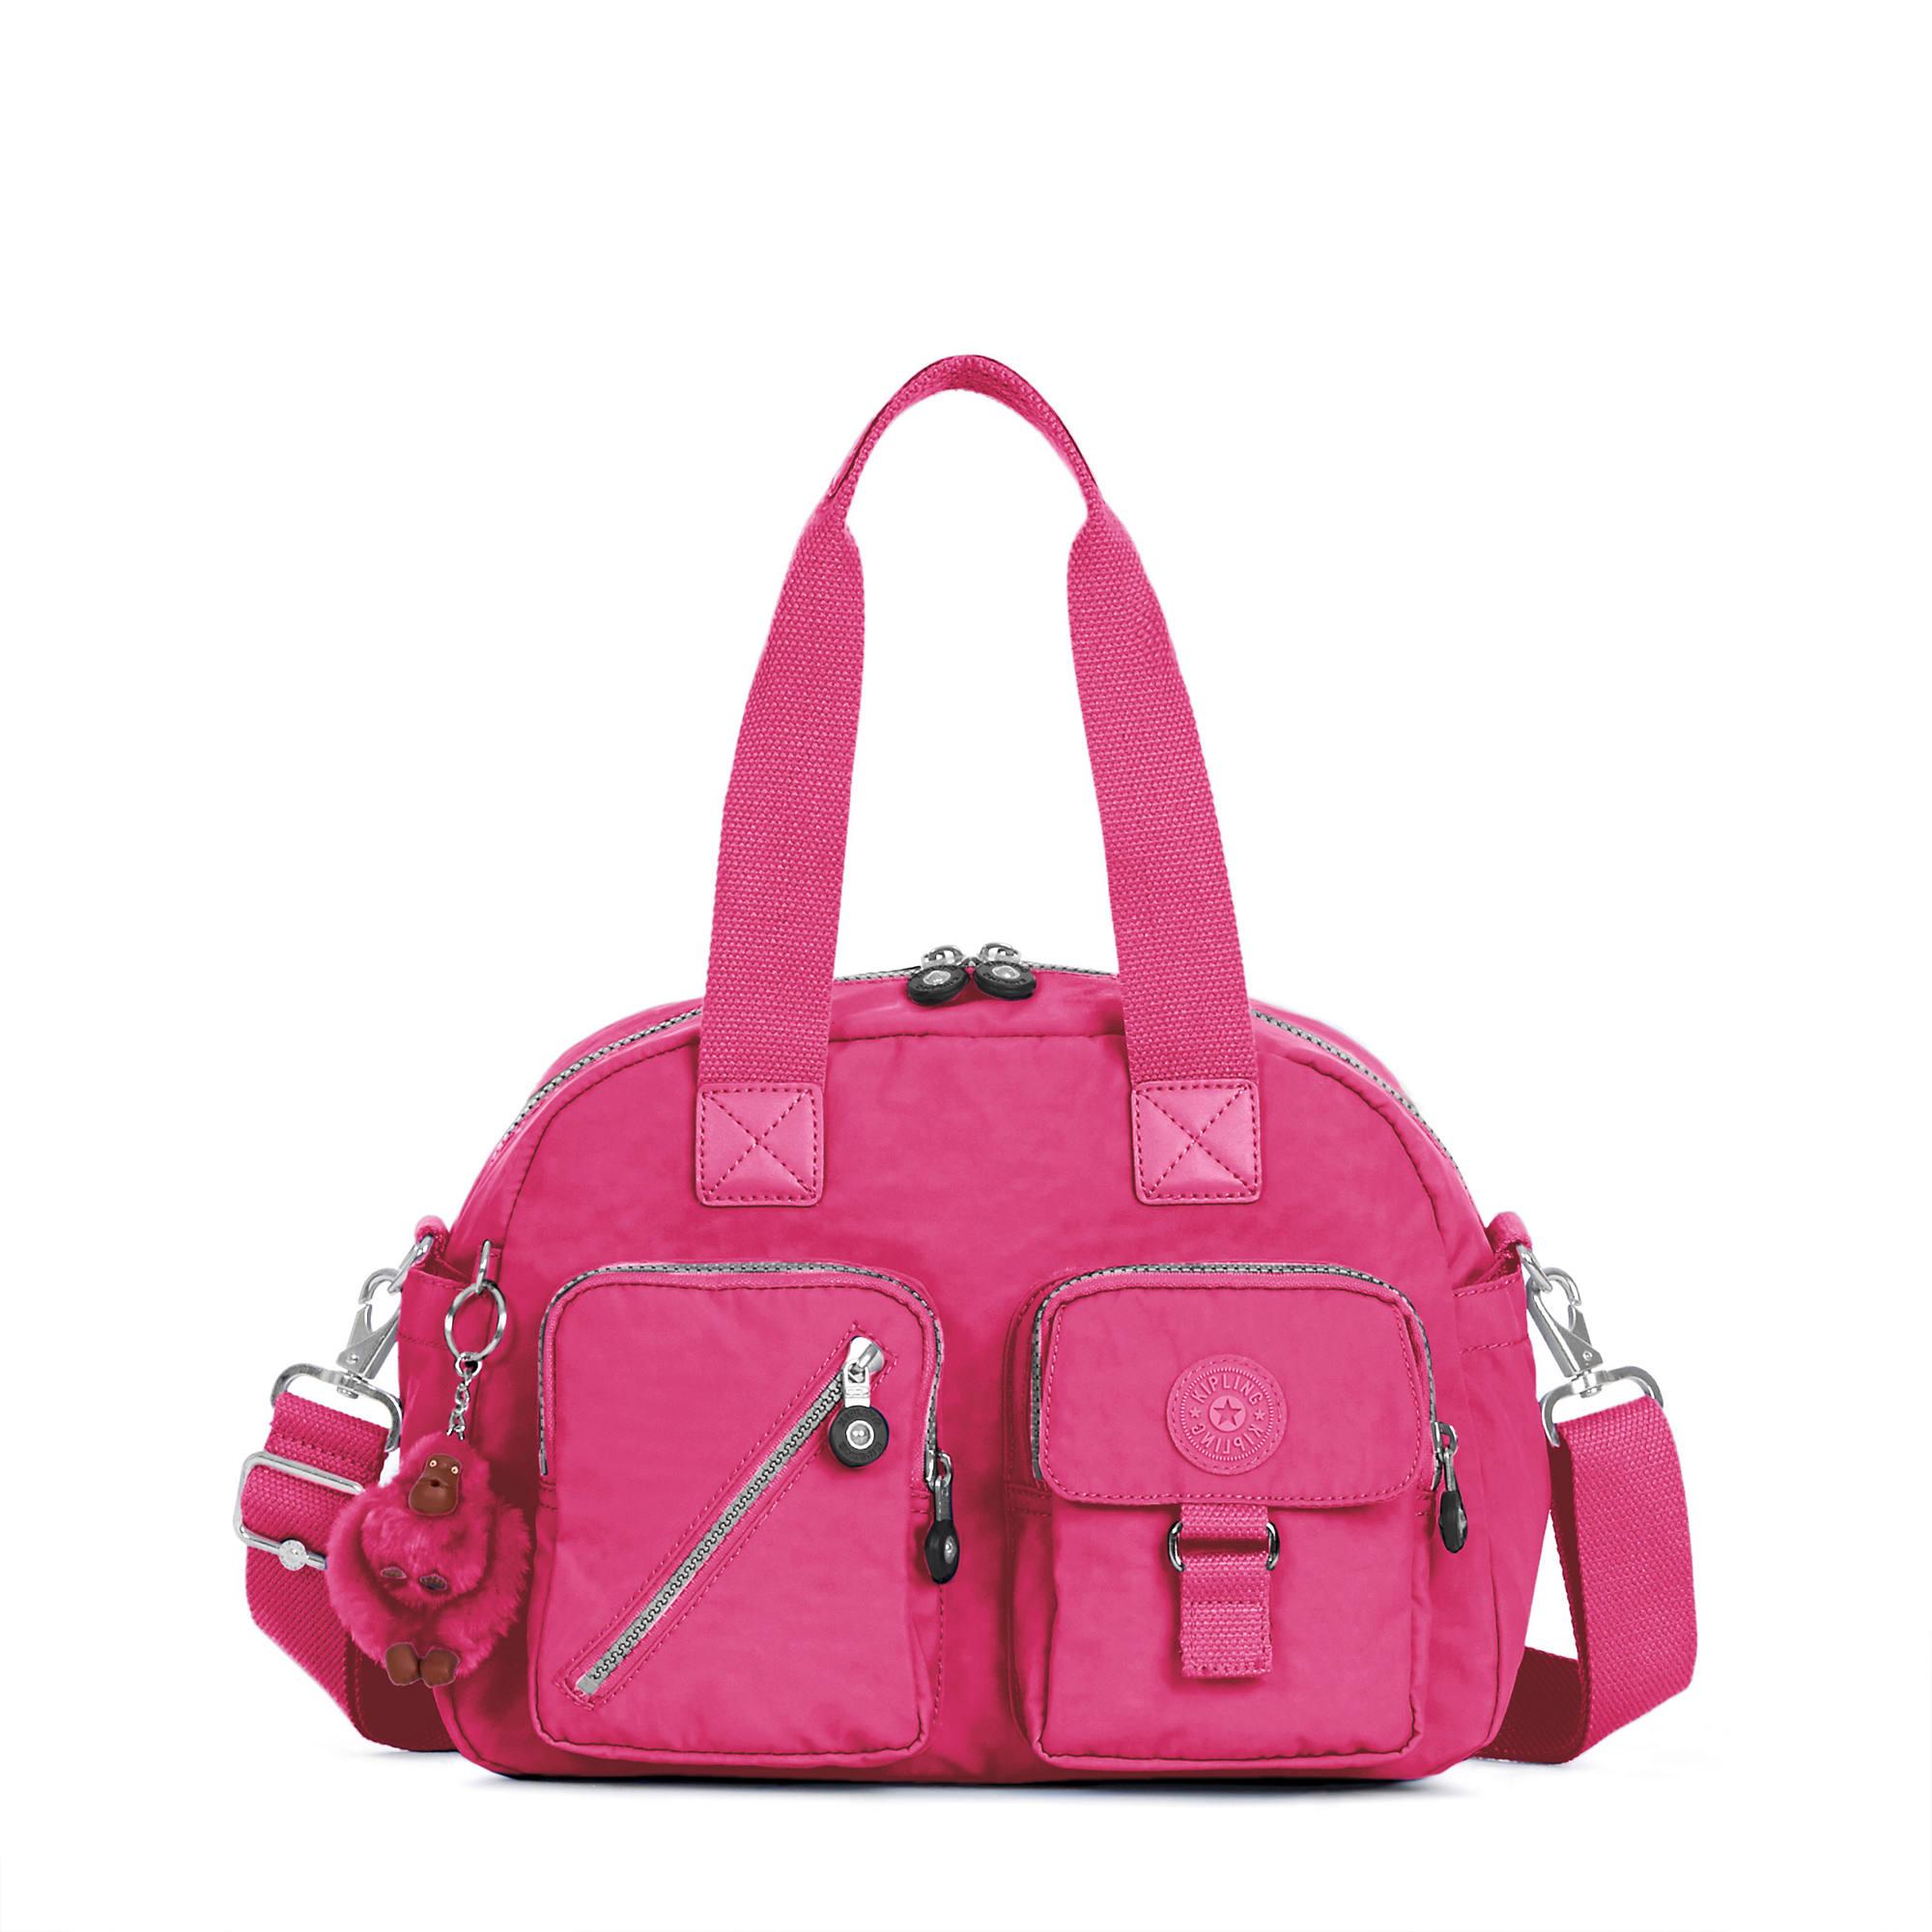 Defea Handbag Kipling